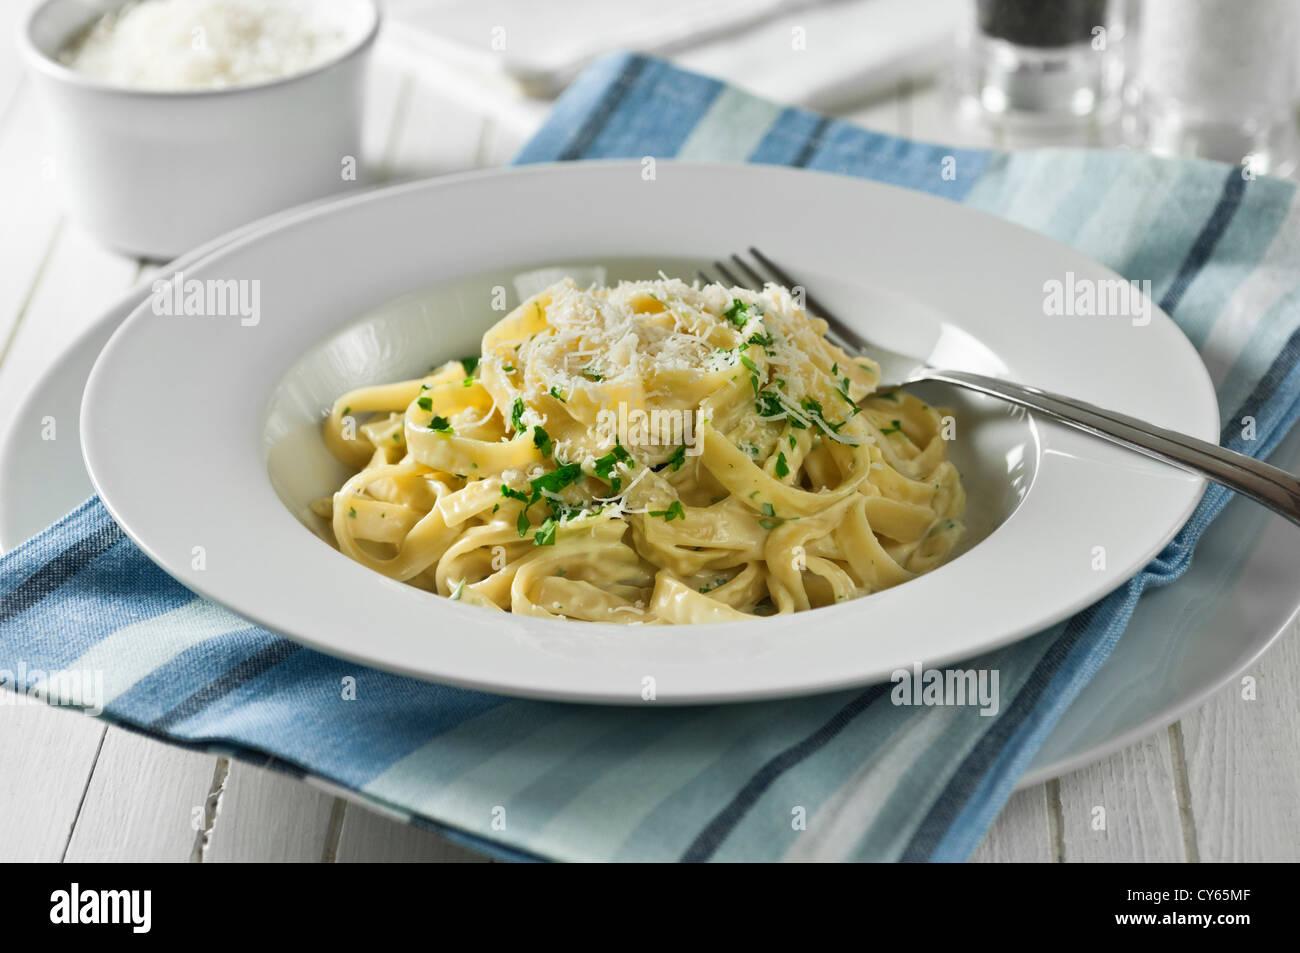 Fettucine Alfredo Pasta and cheese dish - Stock Image